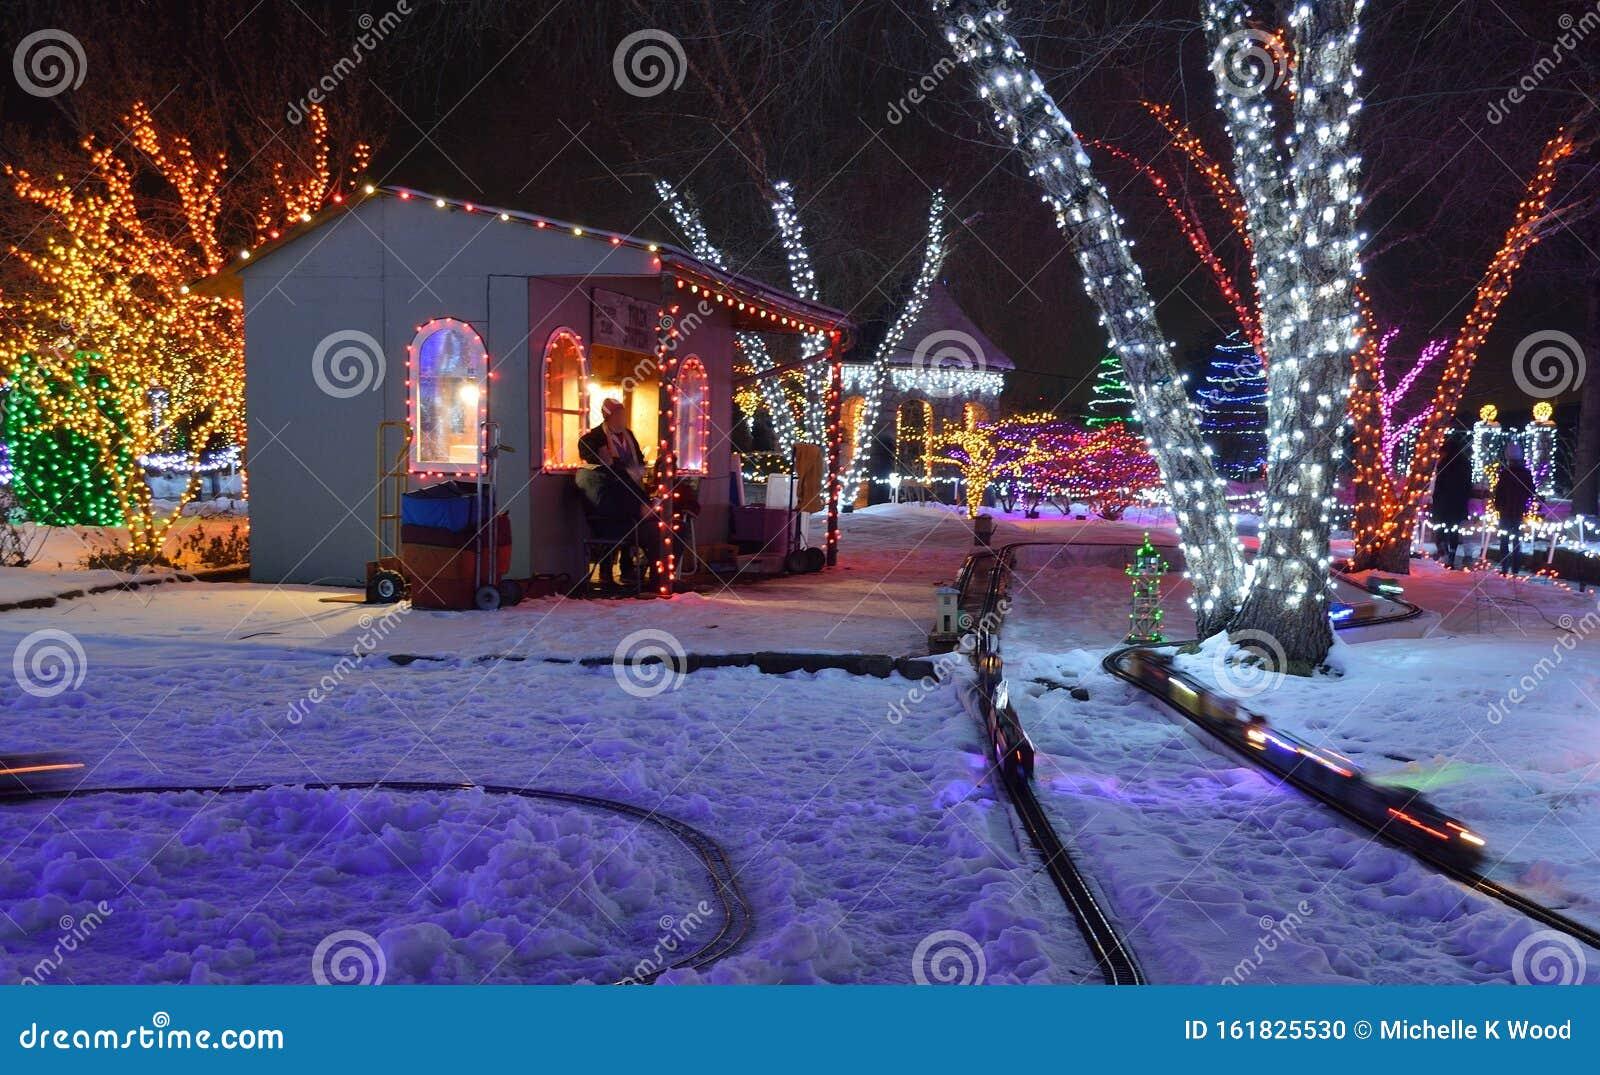 Train Station Trains Tracks Outdoor Christmas Colorful Lights Stock Photo Image Of Botanical Blue 161825530